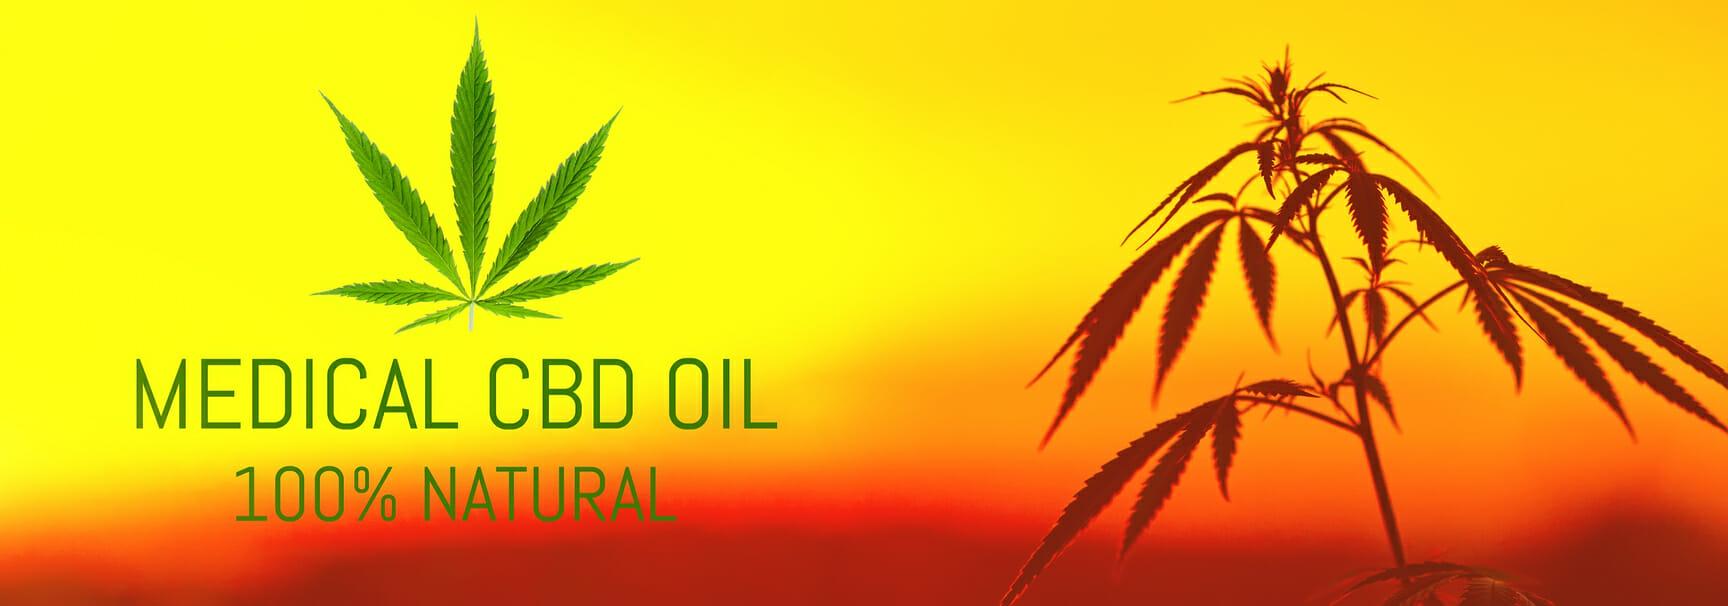 CBD Oil, medical marijuana, cannabis